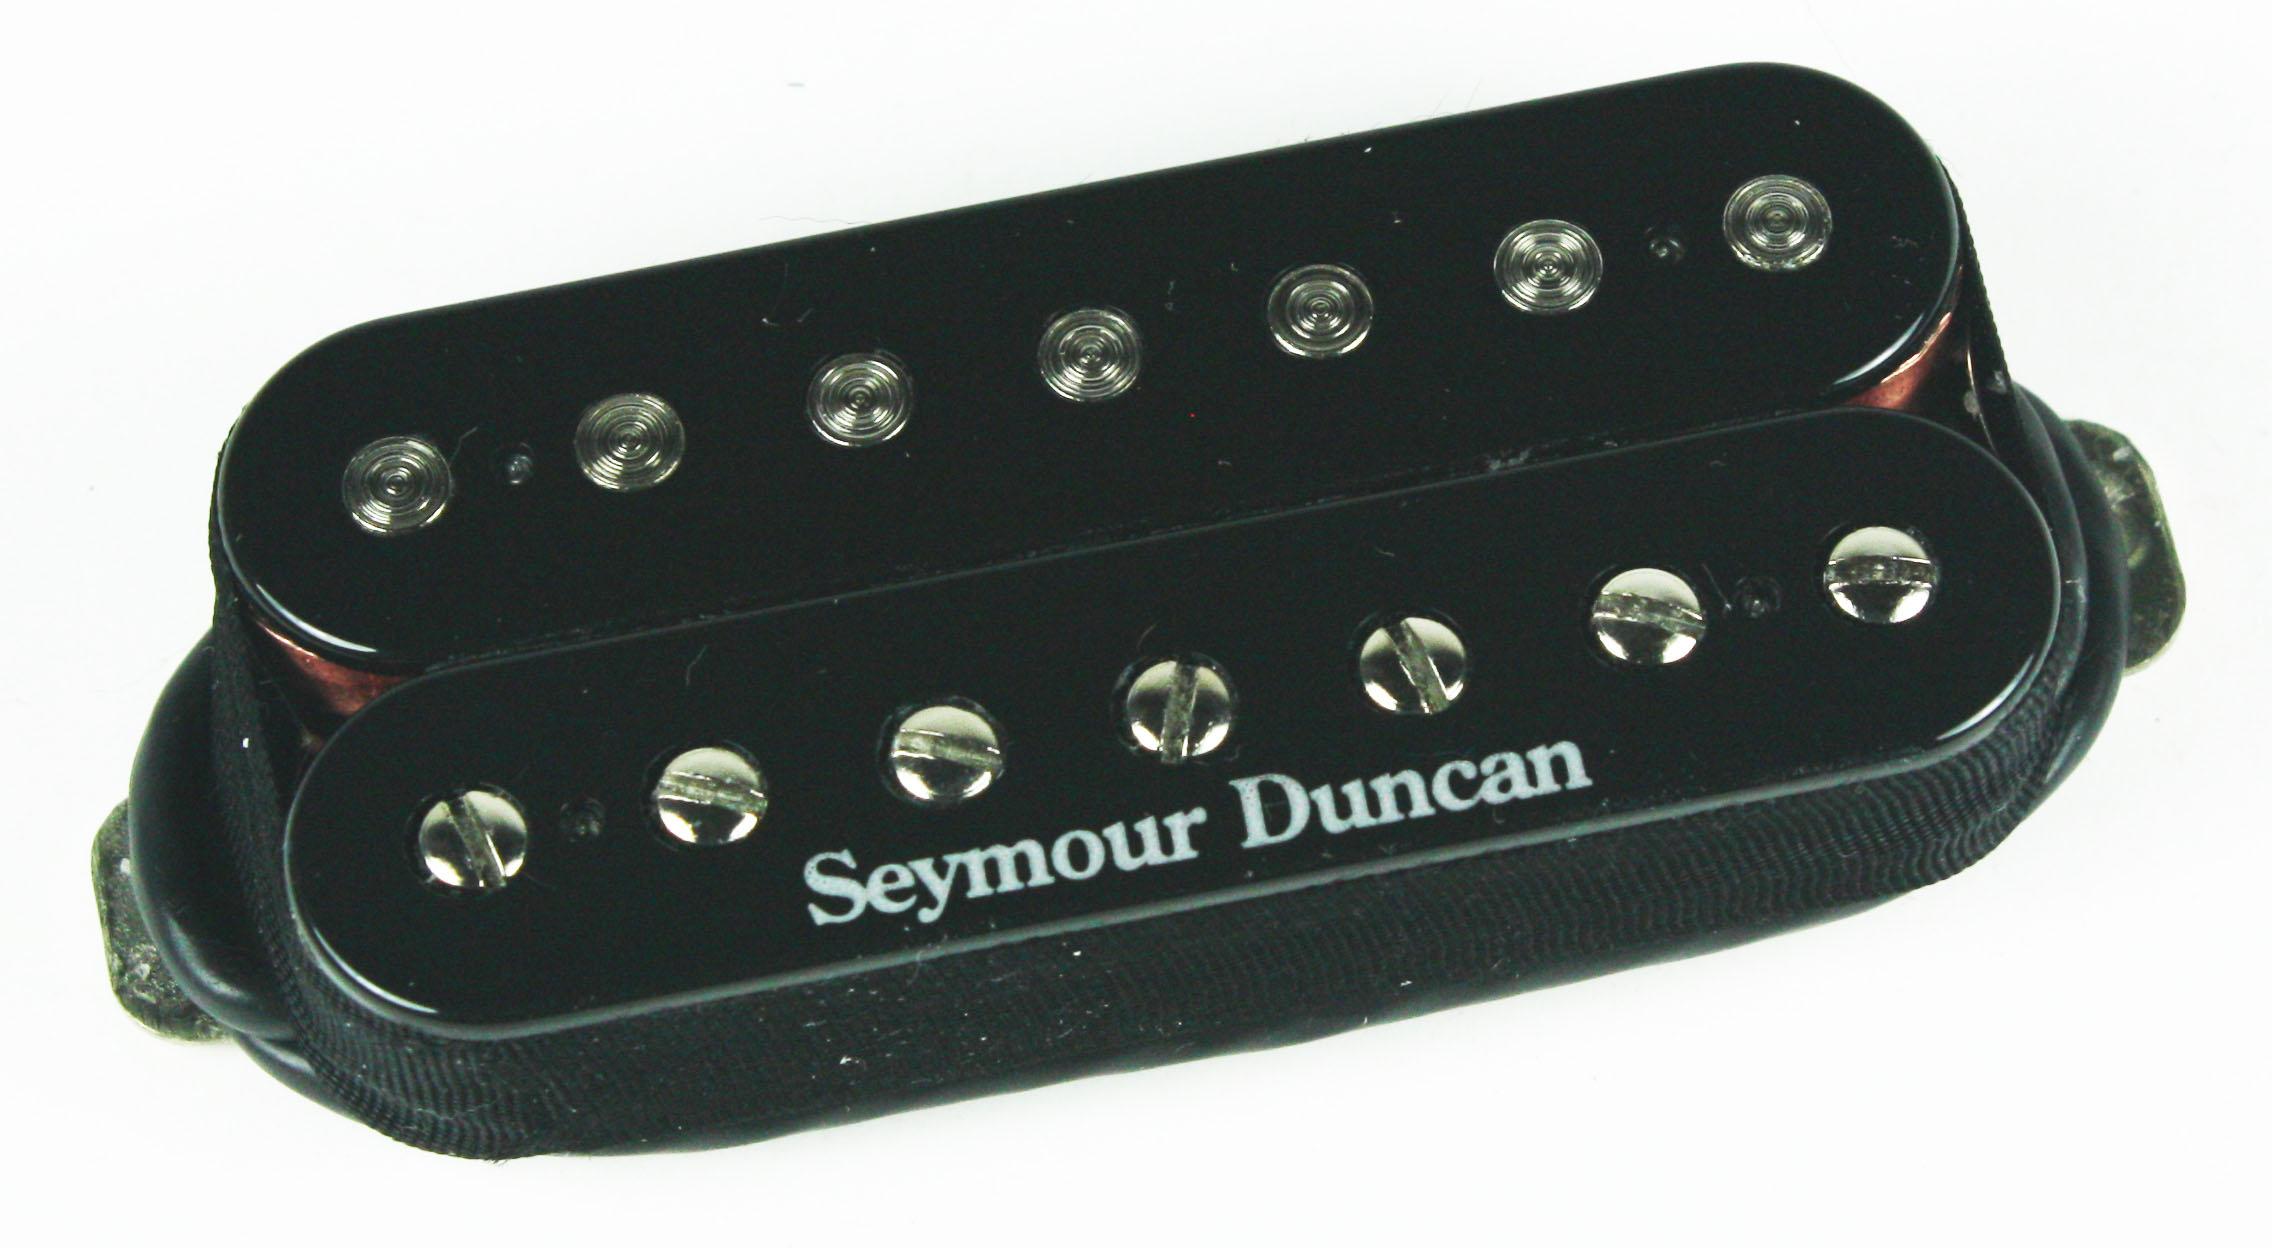 micro guitare seymour duncan 59